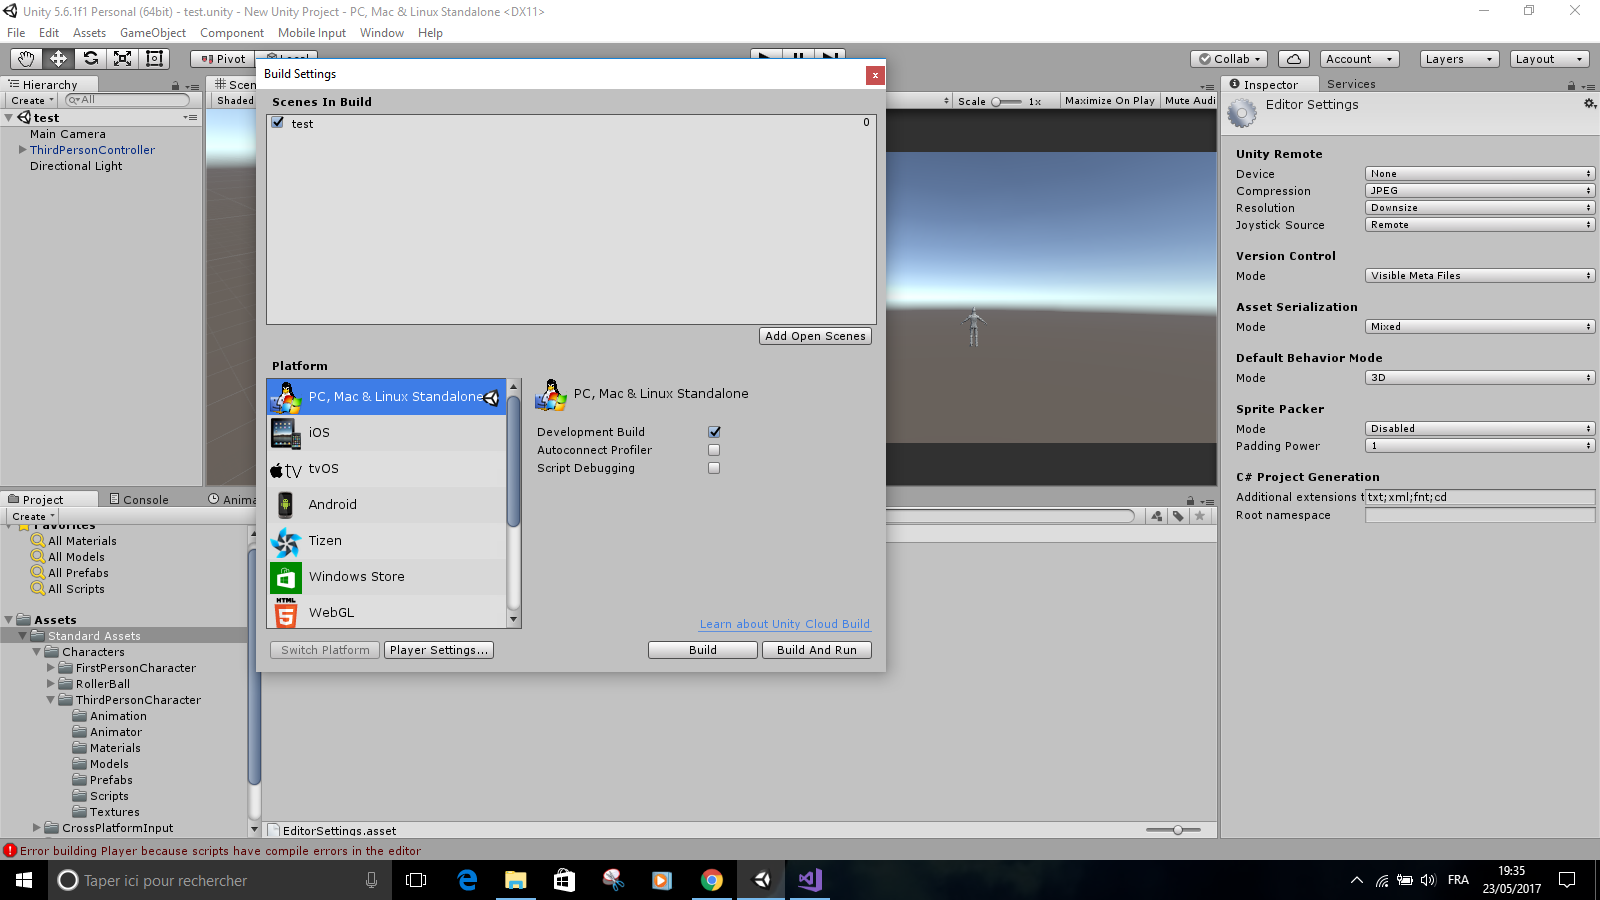 Unity 5 6 1f1 Build errors, Help me please ! - Unity Forum